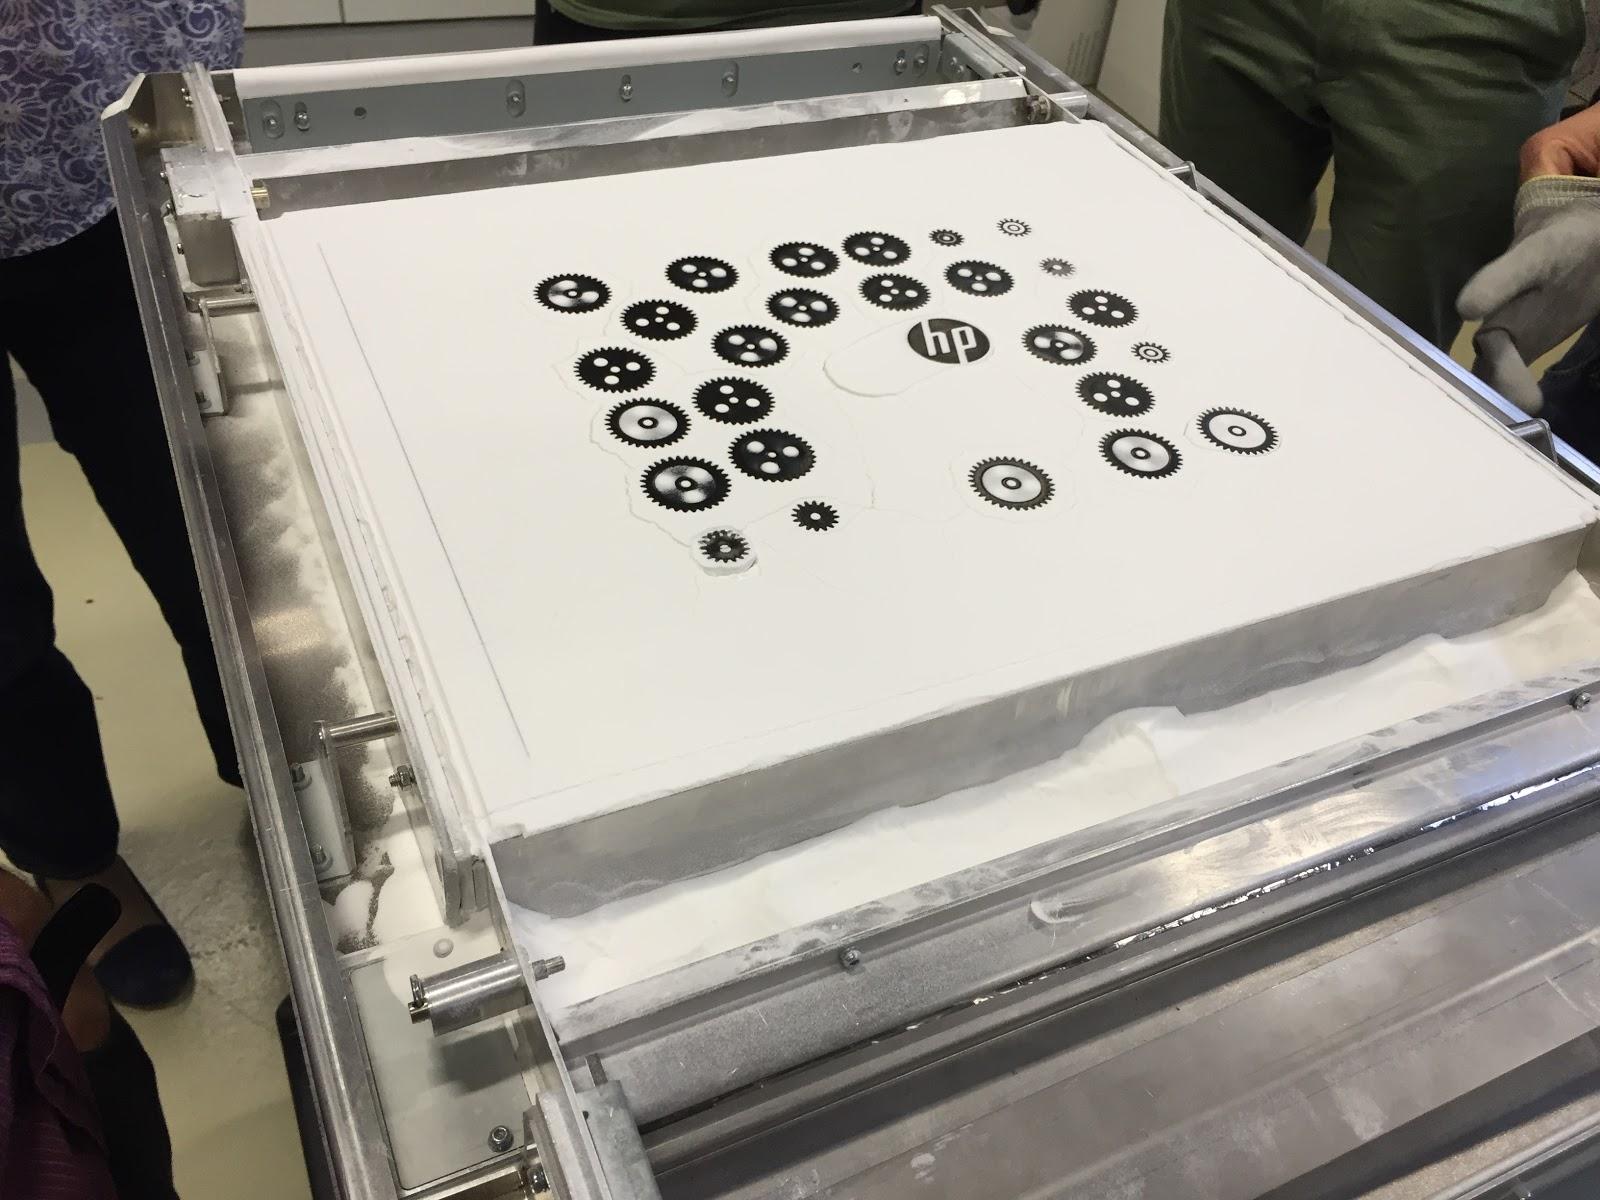 shapeways_hp_mulit_jet_fusion_3d_printer1